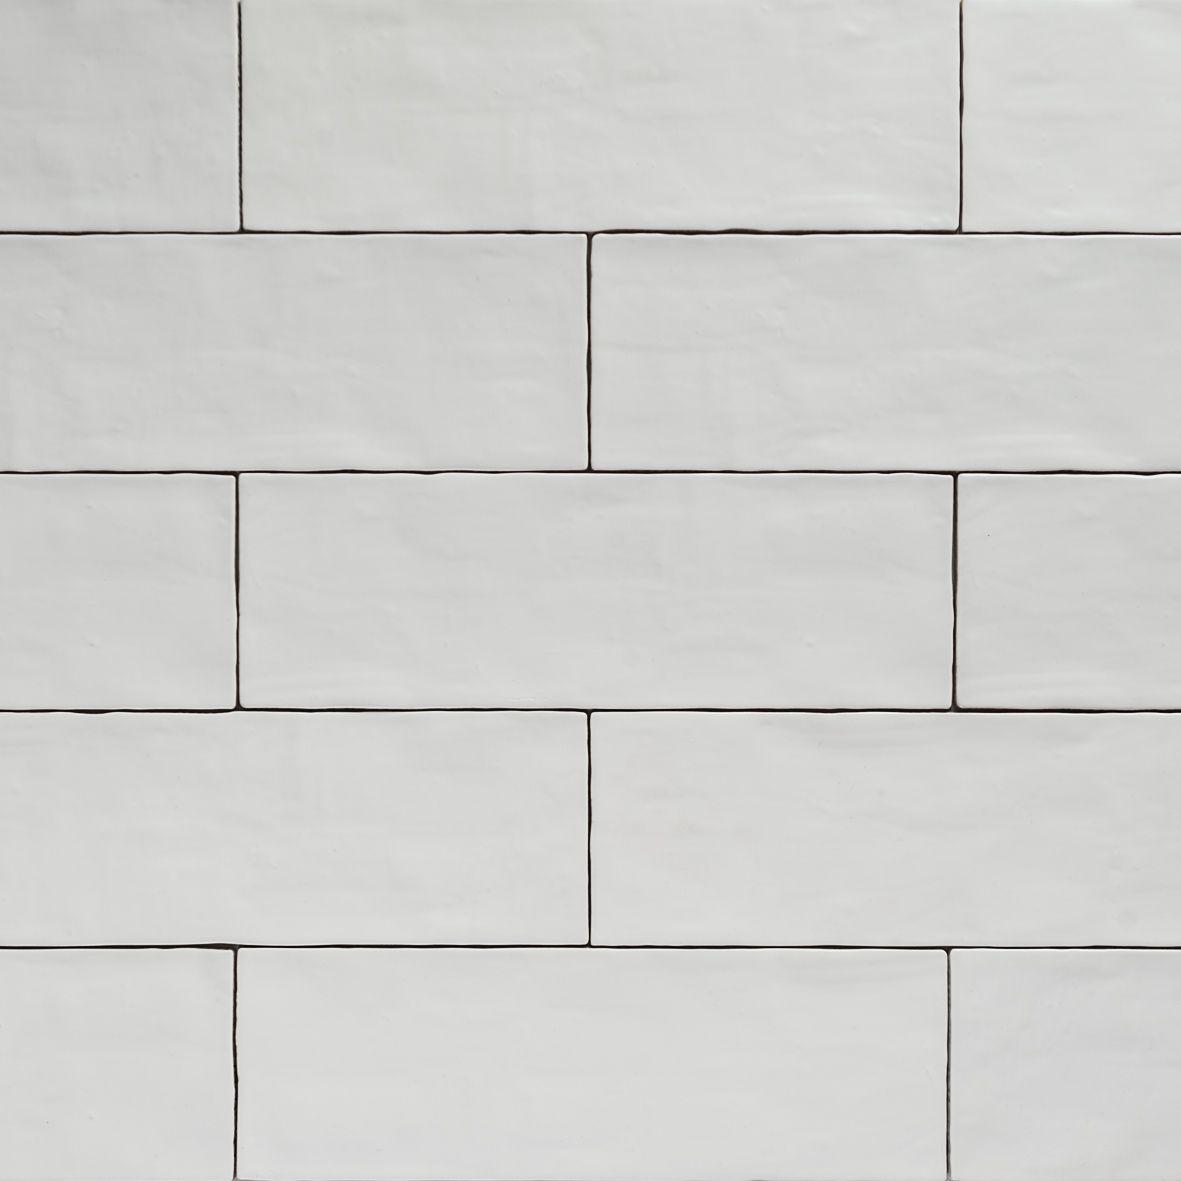 Handmade White Matt Natura Wall Subway Tiles 396 130 In Stretcher Bond Design Subway Tile Handmade Subway Tile White Subway Tiles